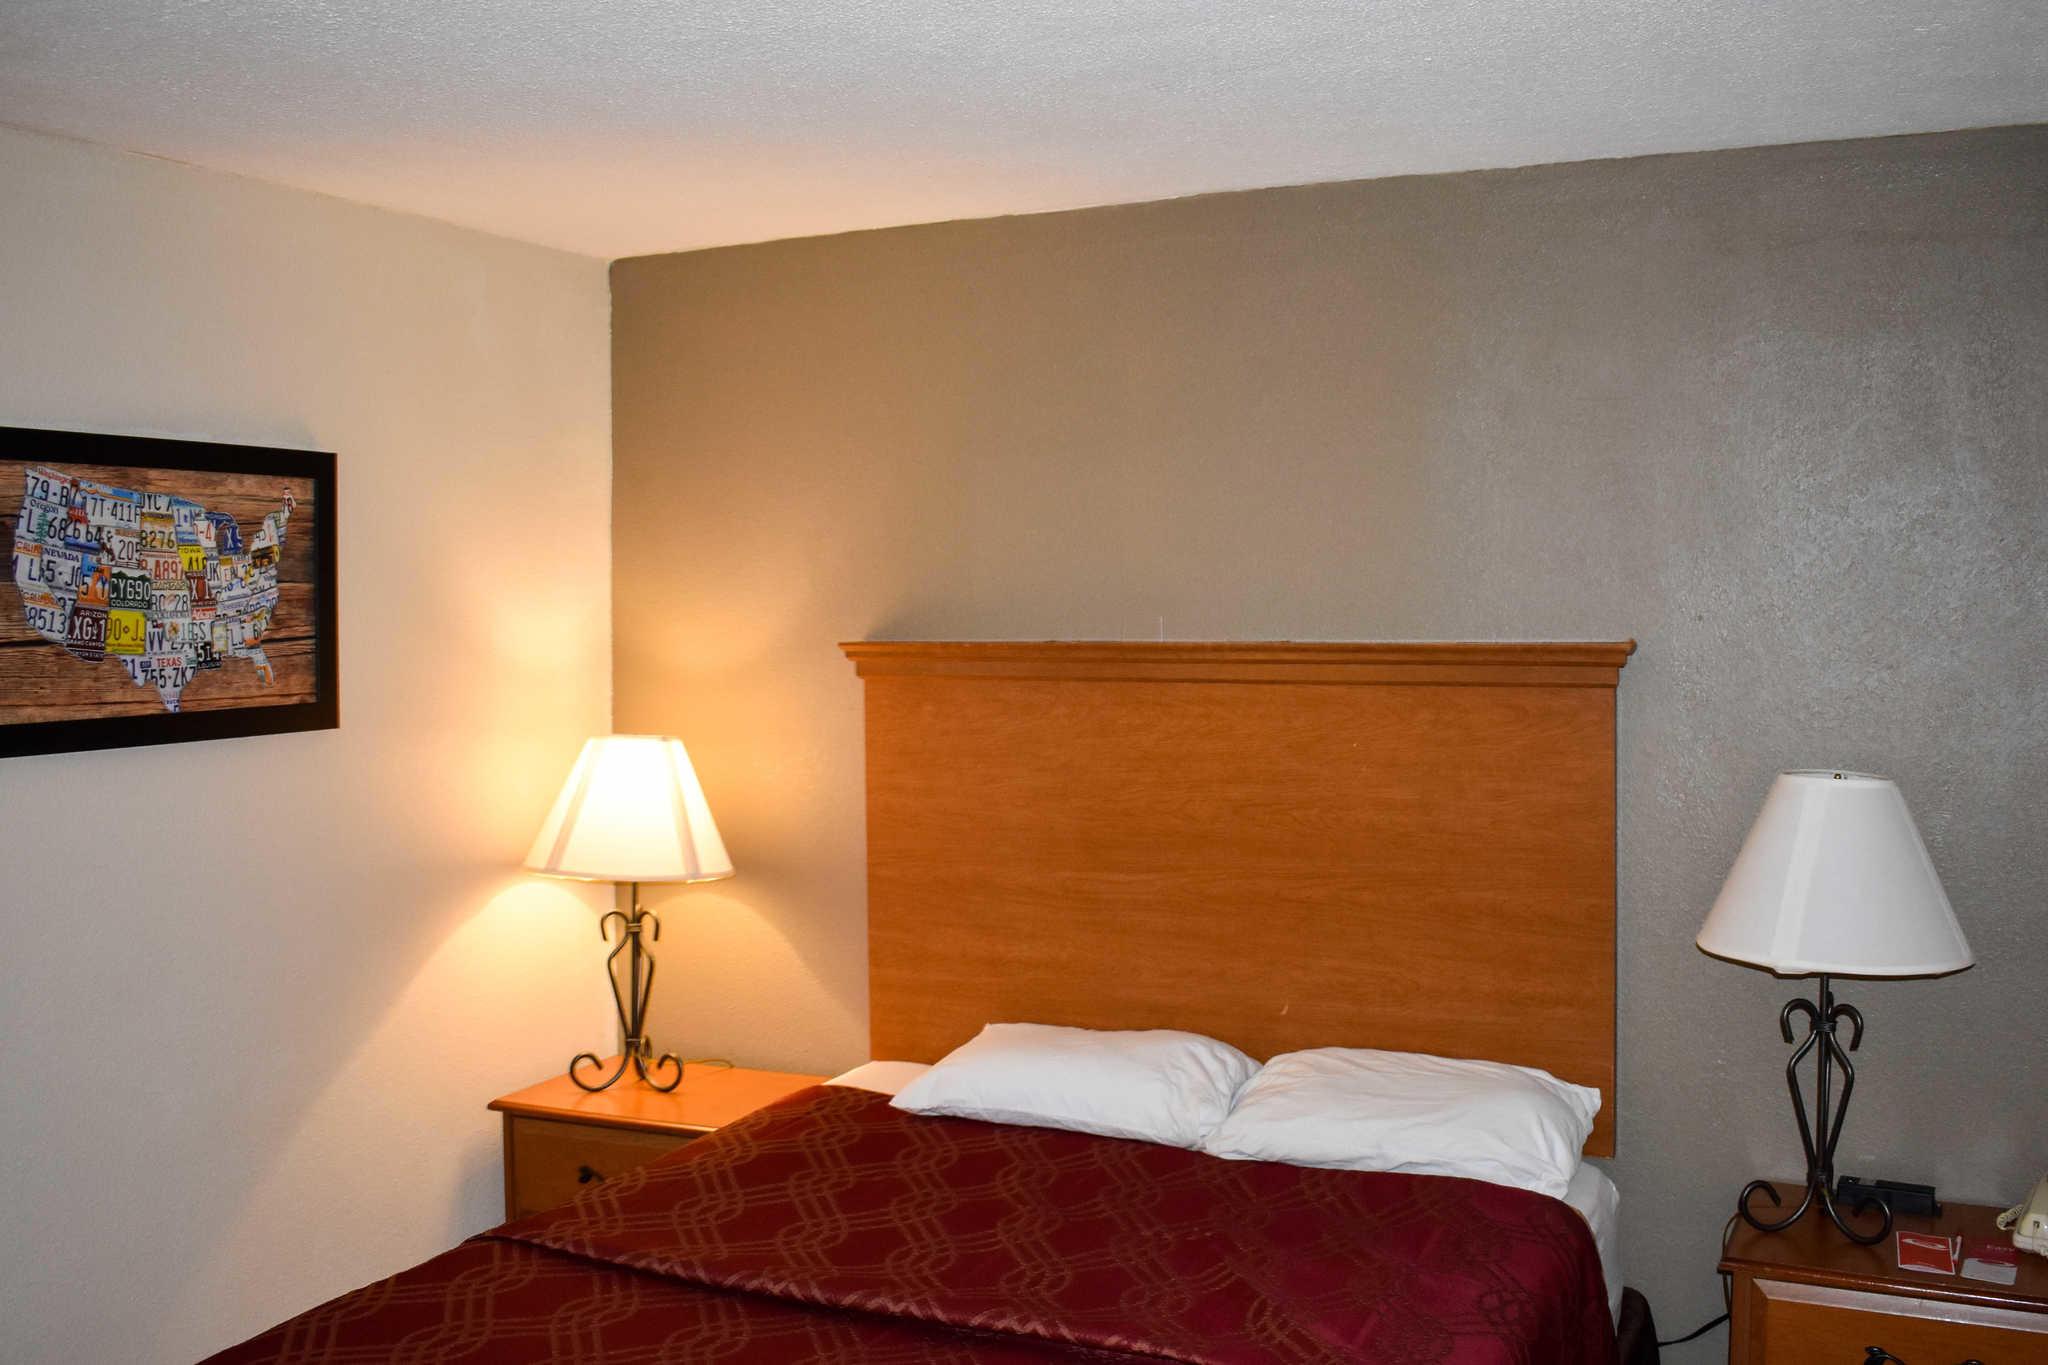 Econo Lodge Inn & Suites - Closed image 13